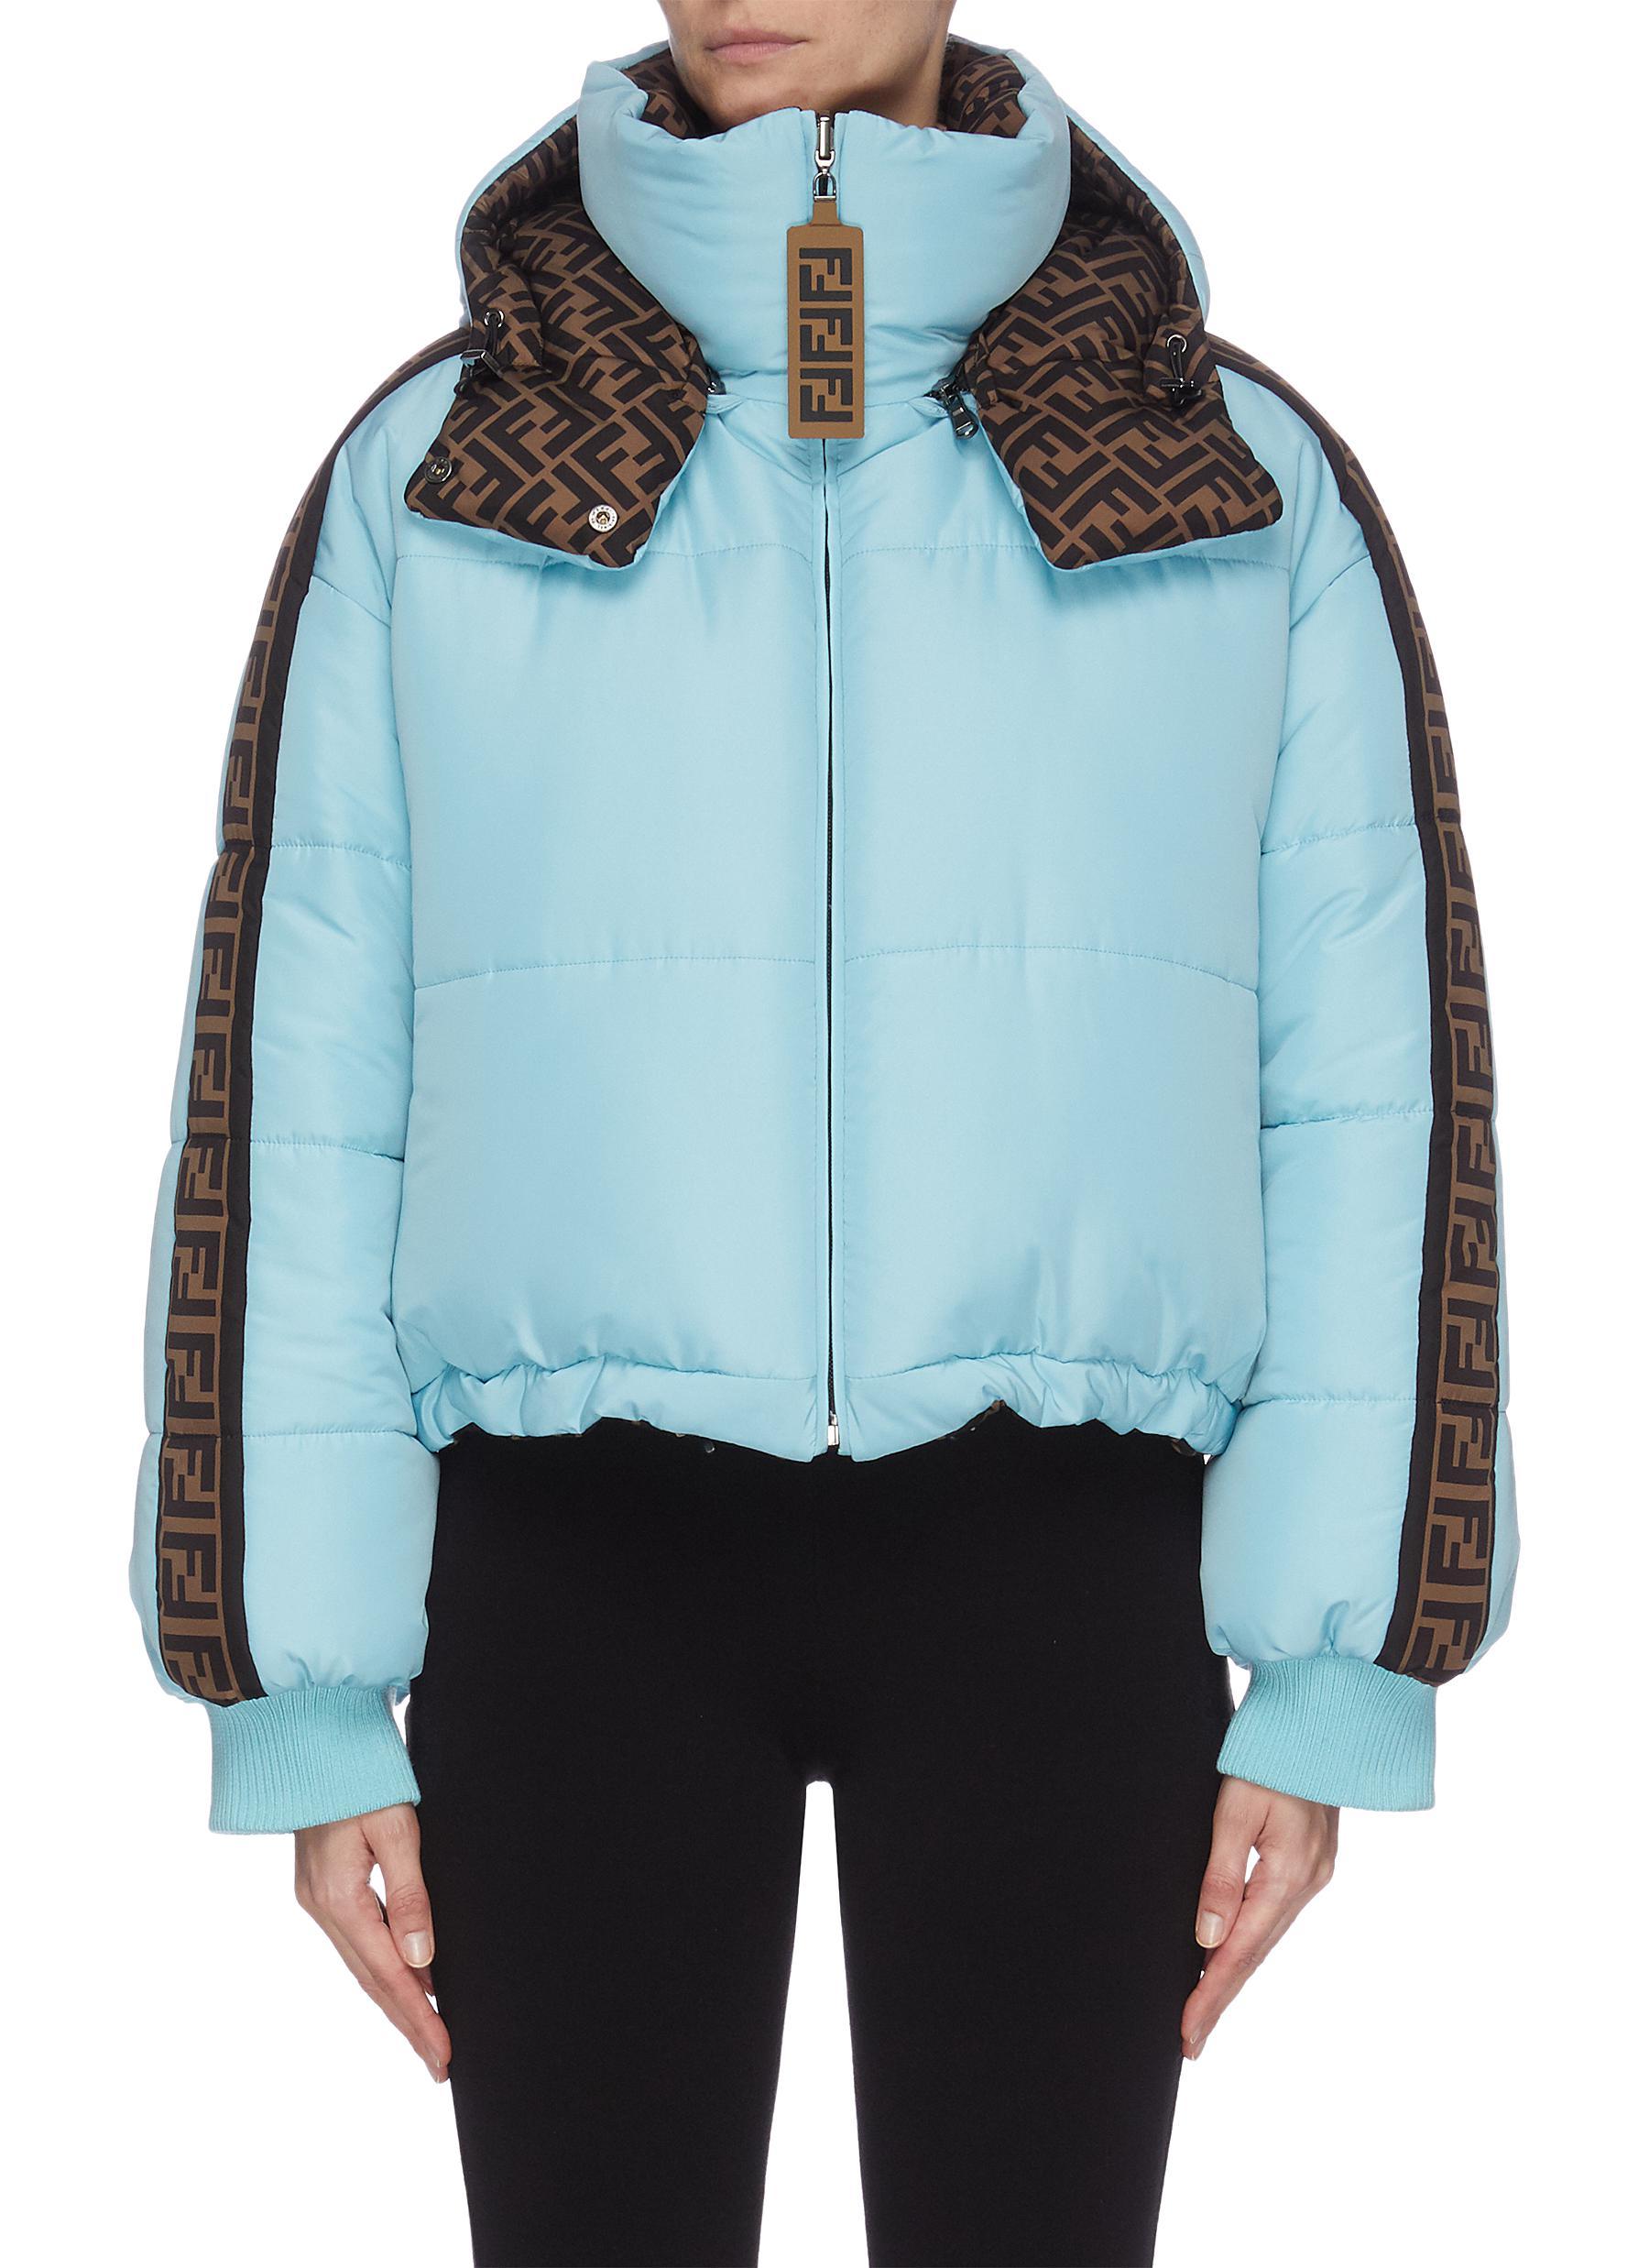 Buy Fendi Sport Jackets 'FENDIRAMA' logo print outseam cropped down reversible jacket